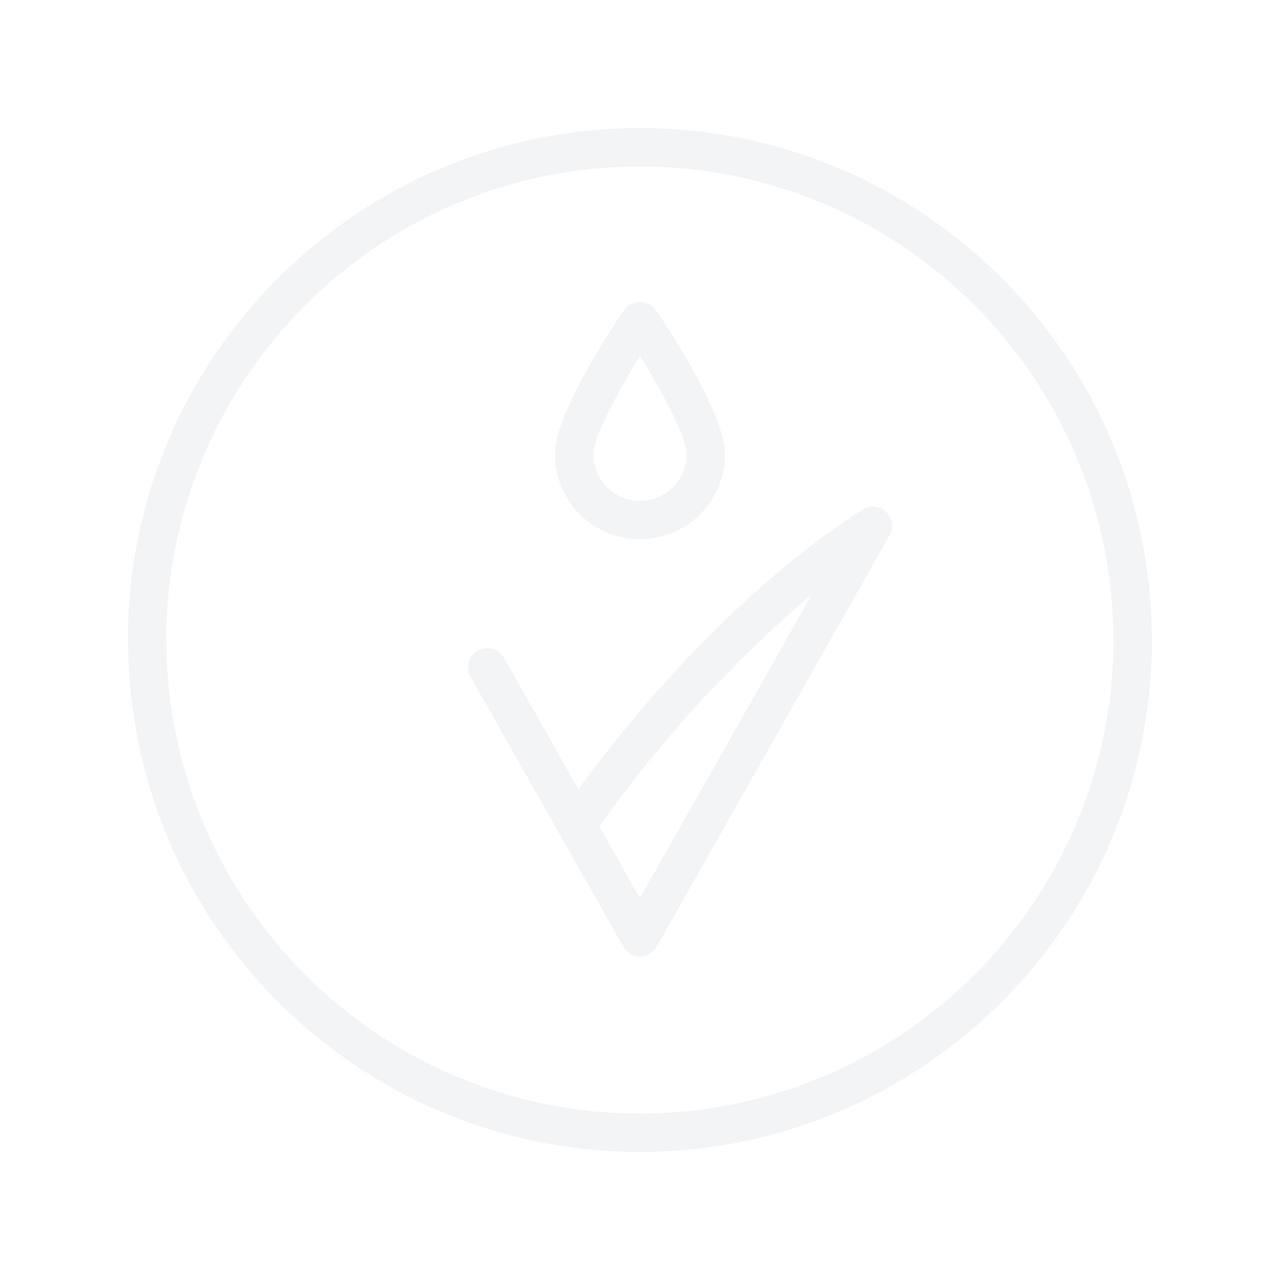 SCHWARZKOPF PROFESSIONAL BC Q10 Time Restore Rejuvenating Serum 30ml сыворотка для зрелых волос